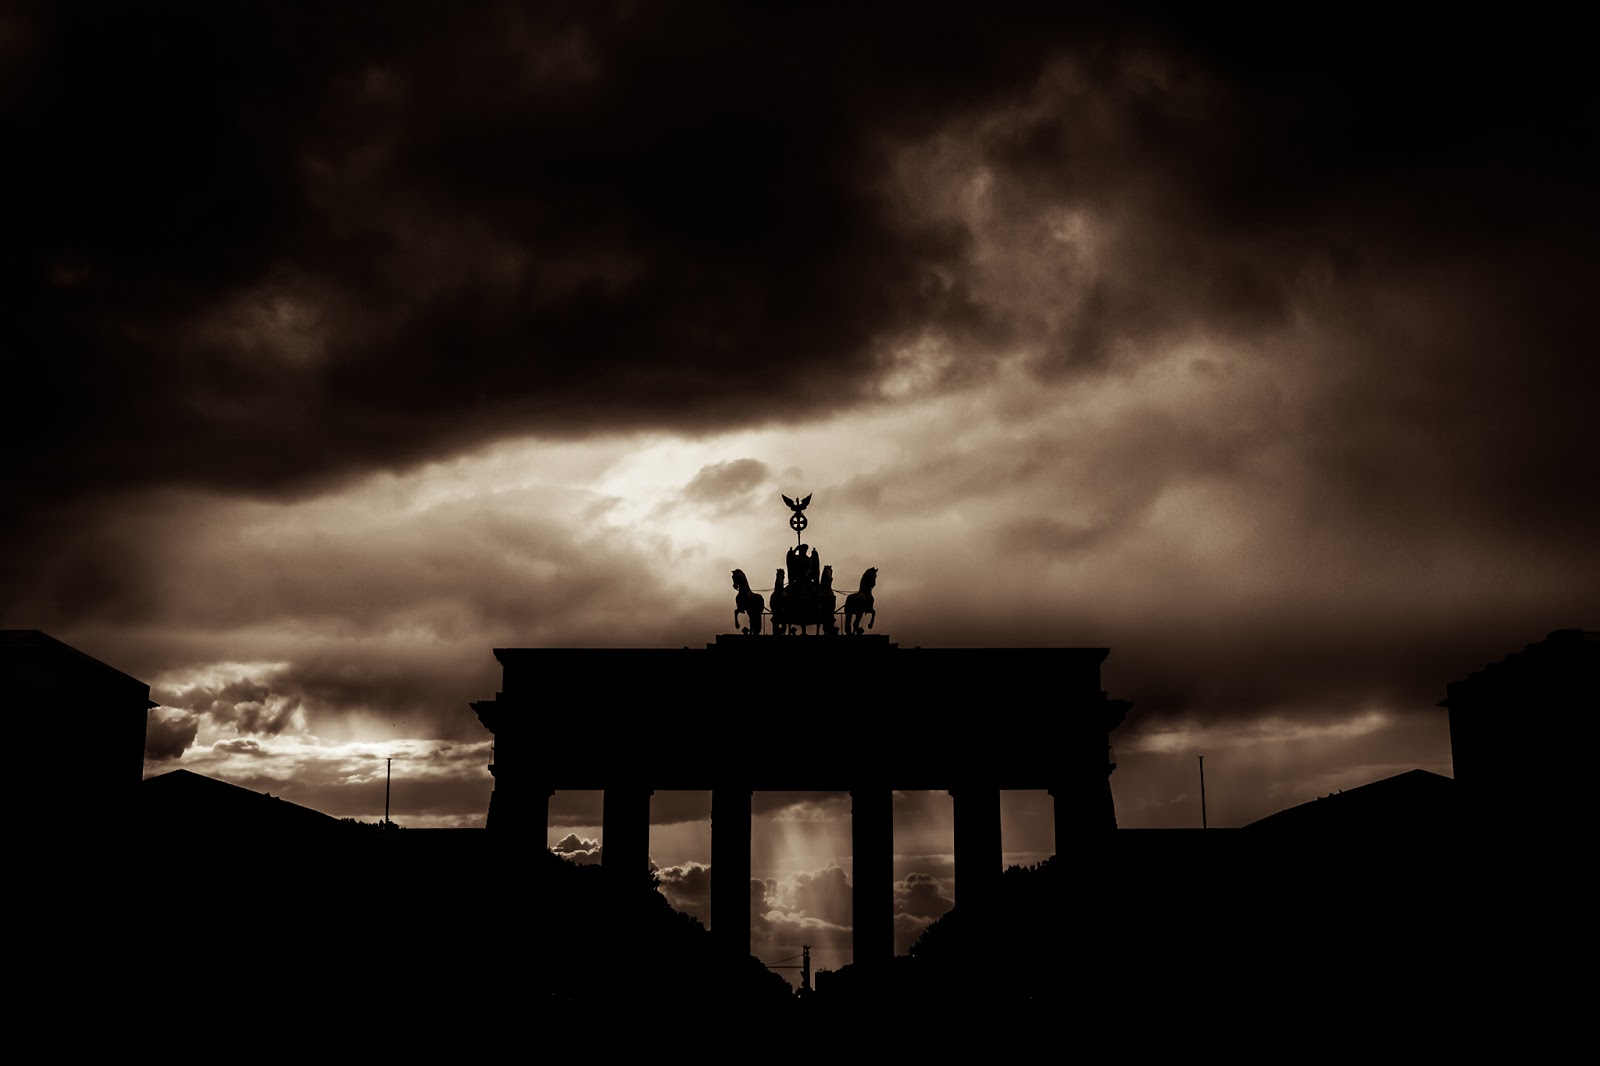 Brandenburger Tor :: Canon EOS5D MkIII | ISO100 | Canon17-40 @25mm | f/6.3 | 1/1250s